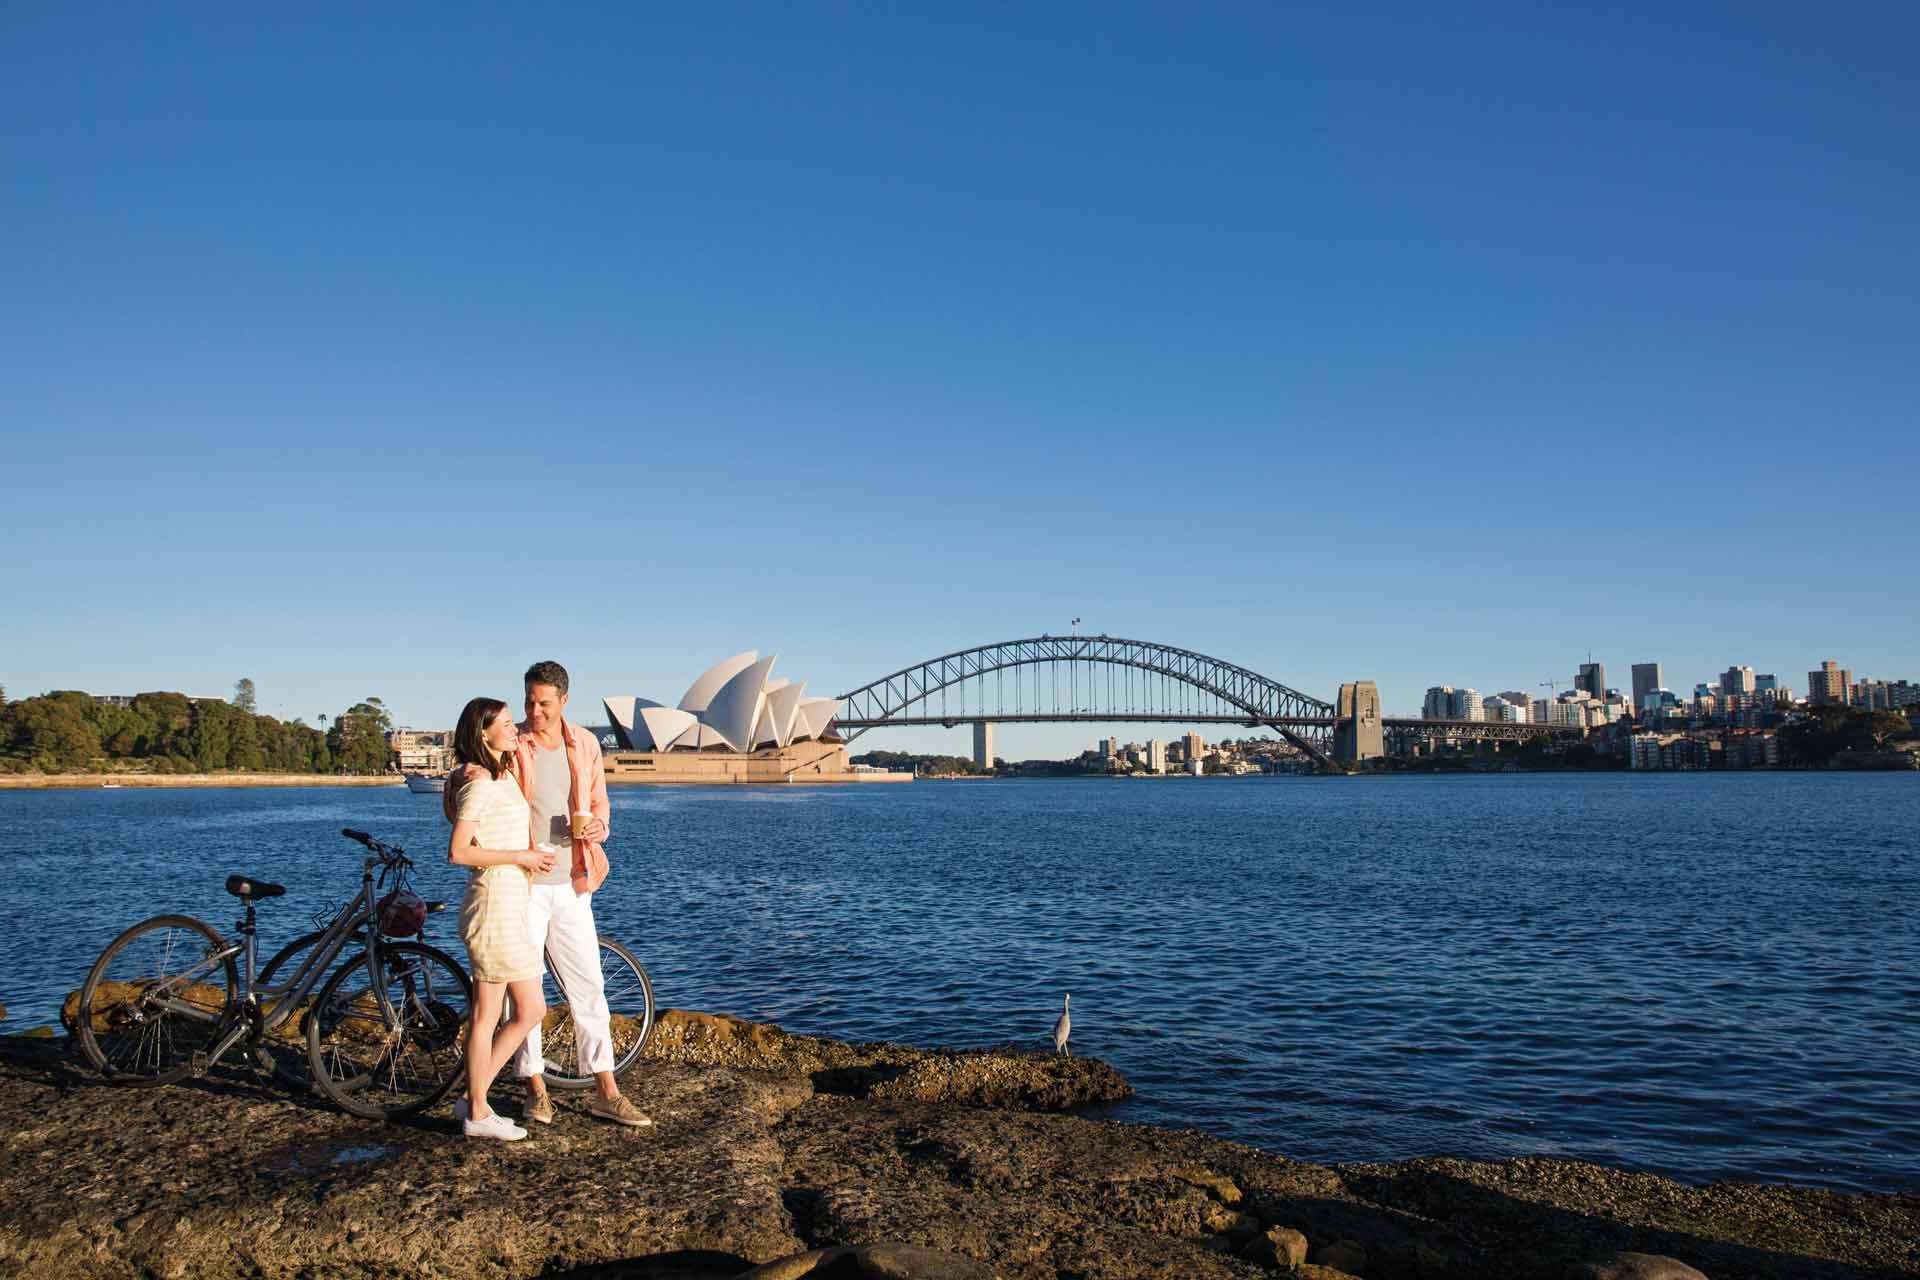 132798-19-Mrs-Macquarie's-Chair-Sydney-